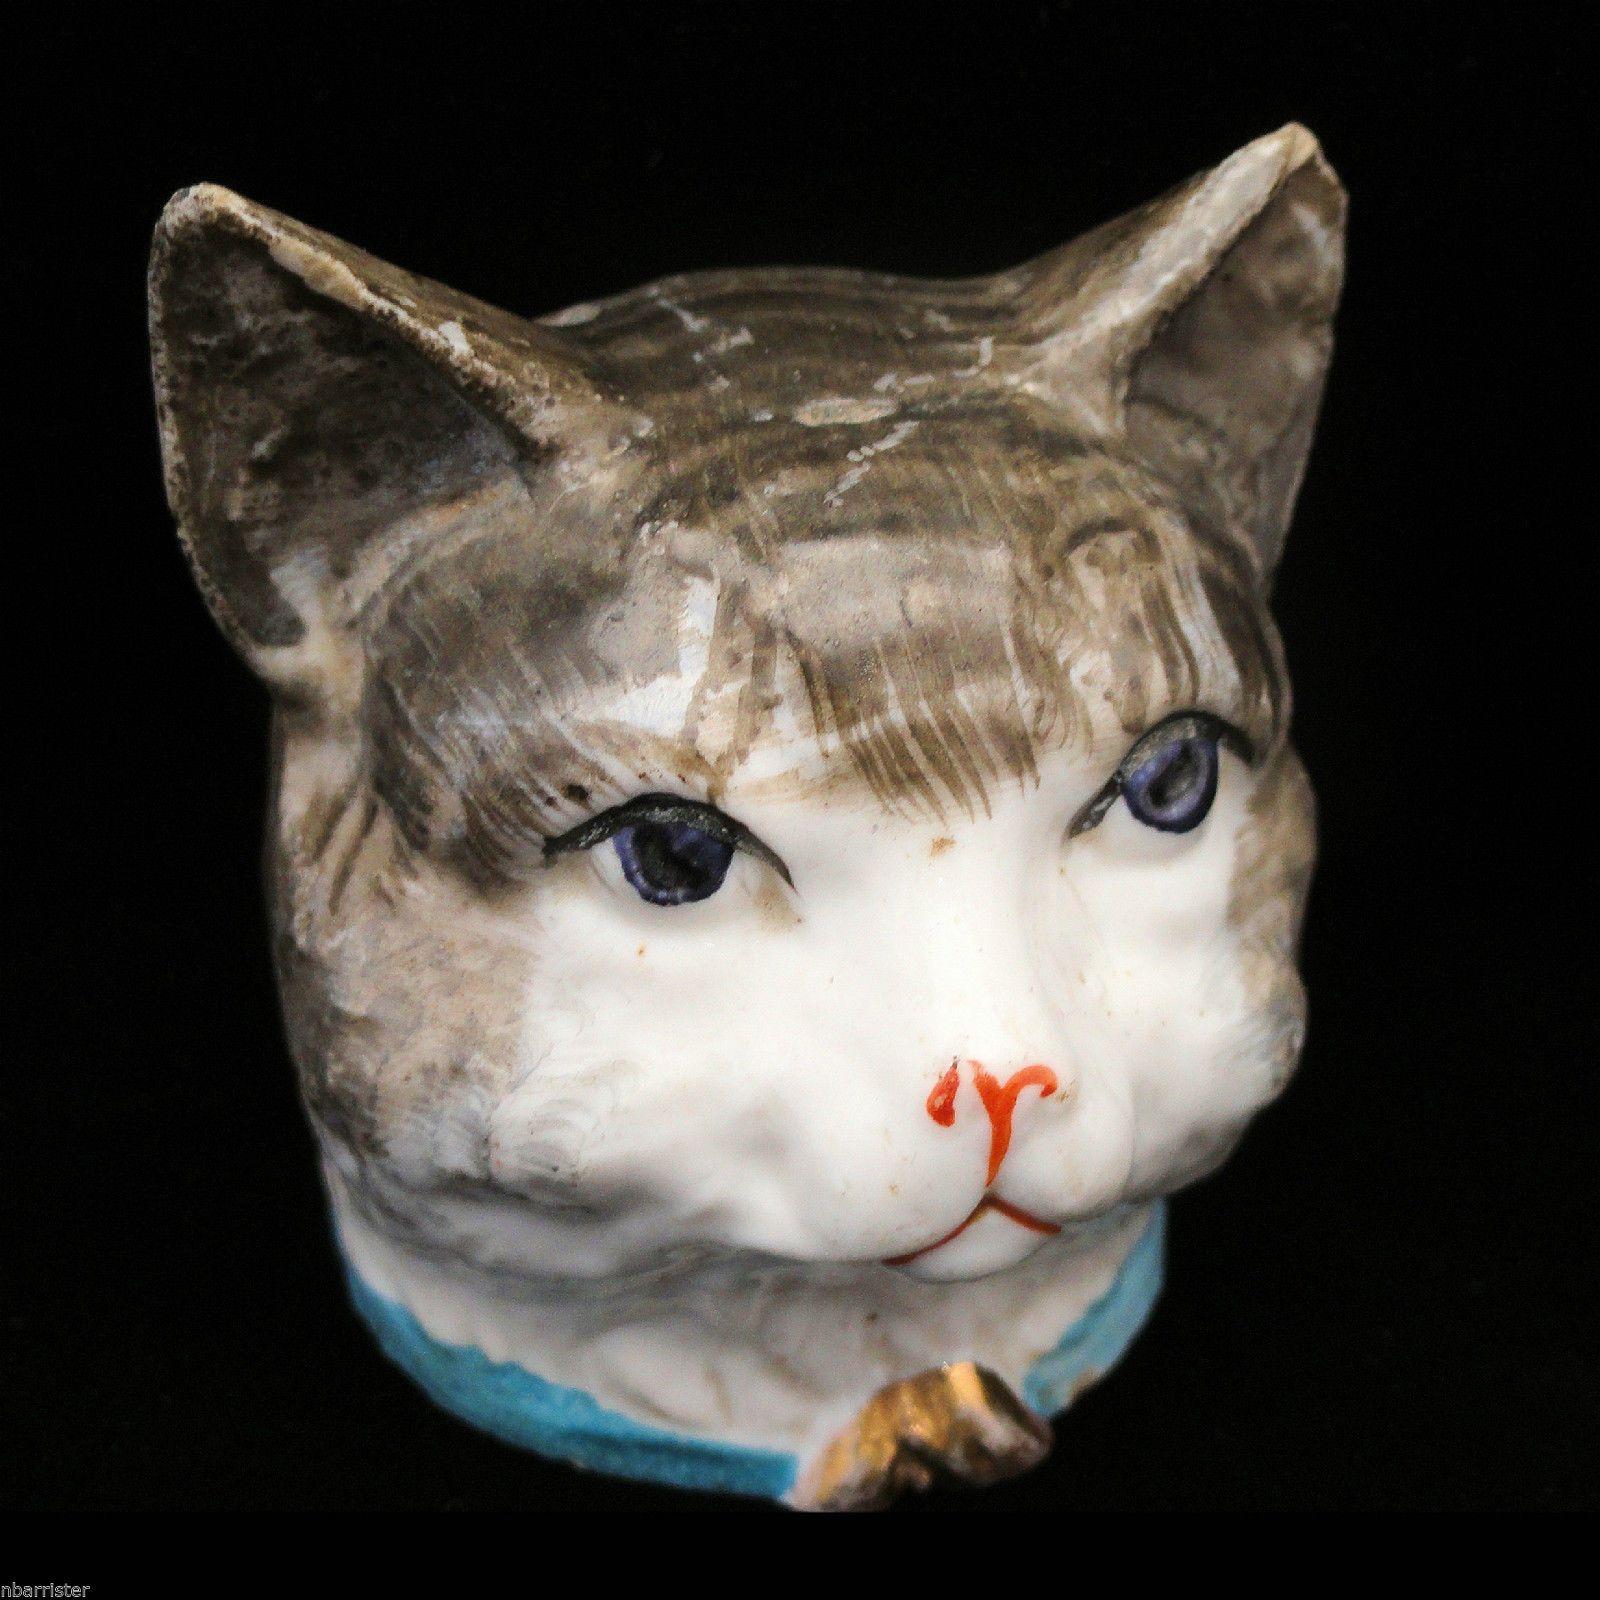 Rare Figural Cat Money Box Penny Bank England 1910 Kitten With Big Bow Penny Bank Kitten Cat Piggy Bank